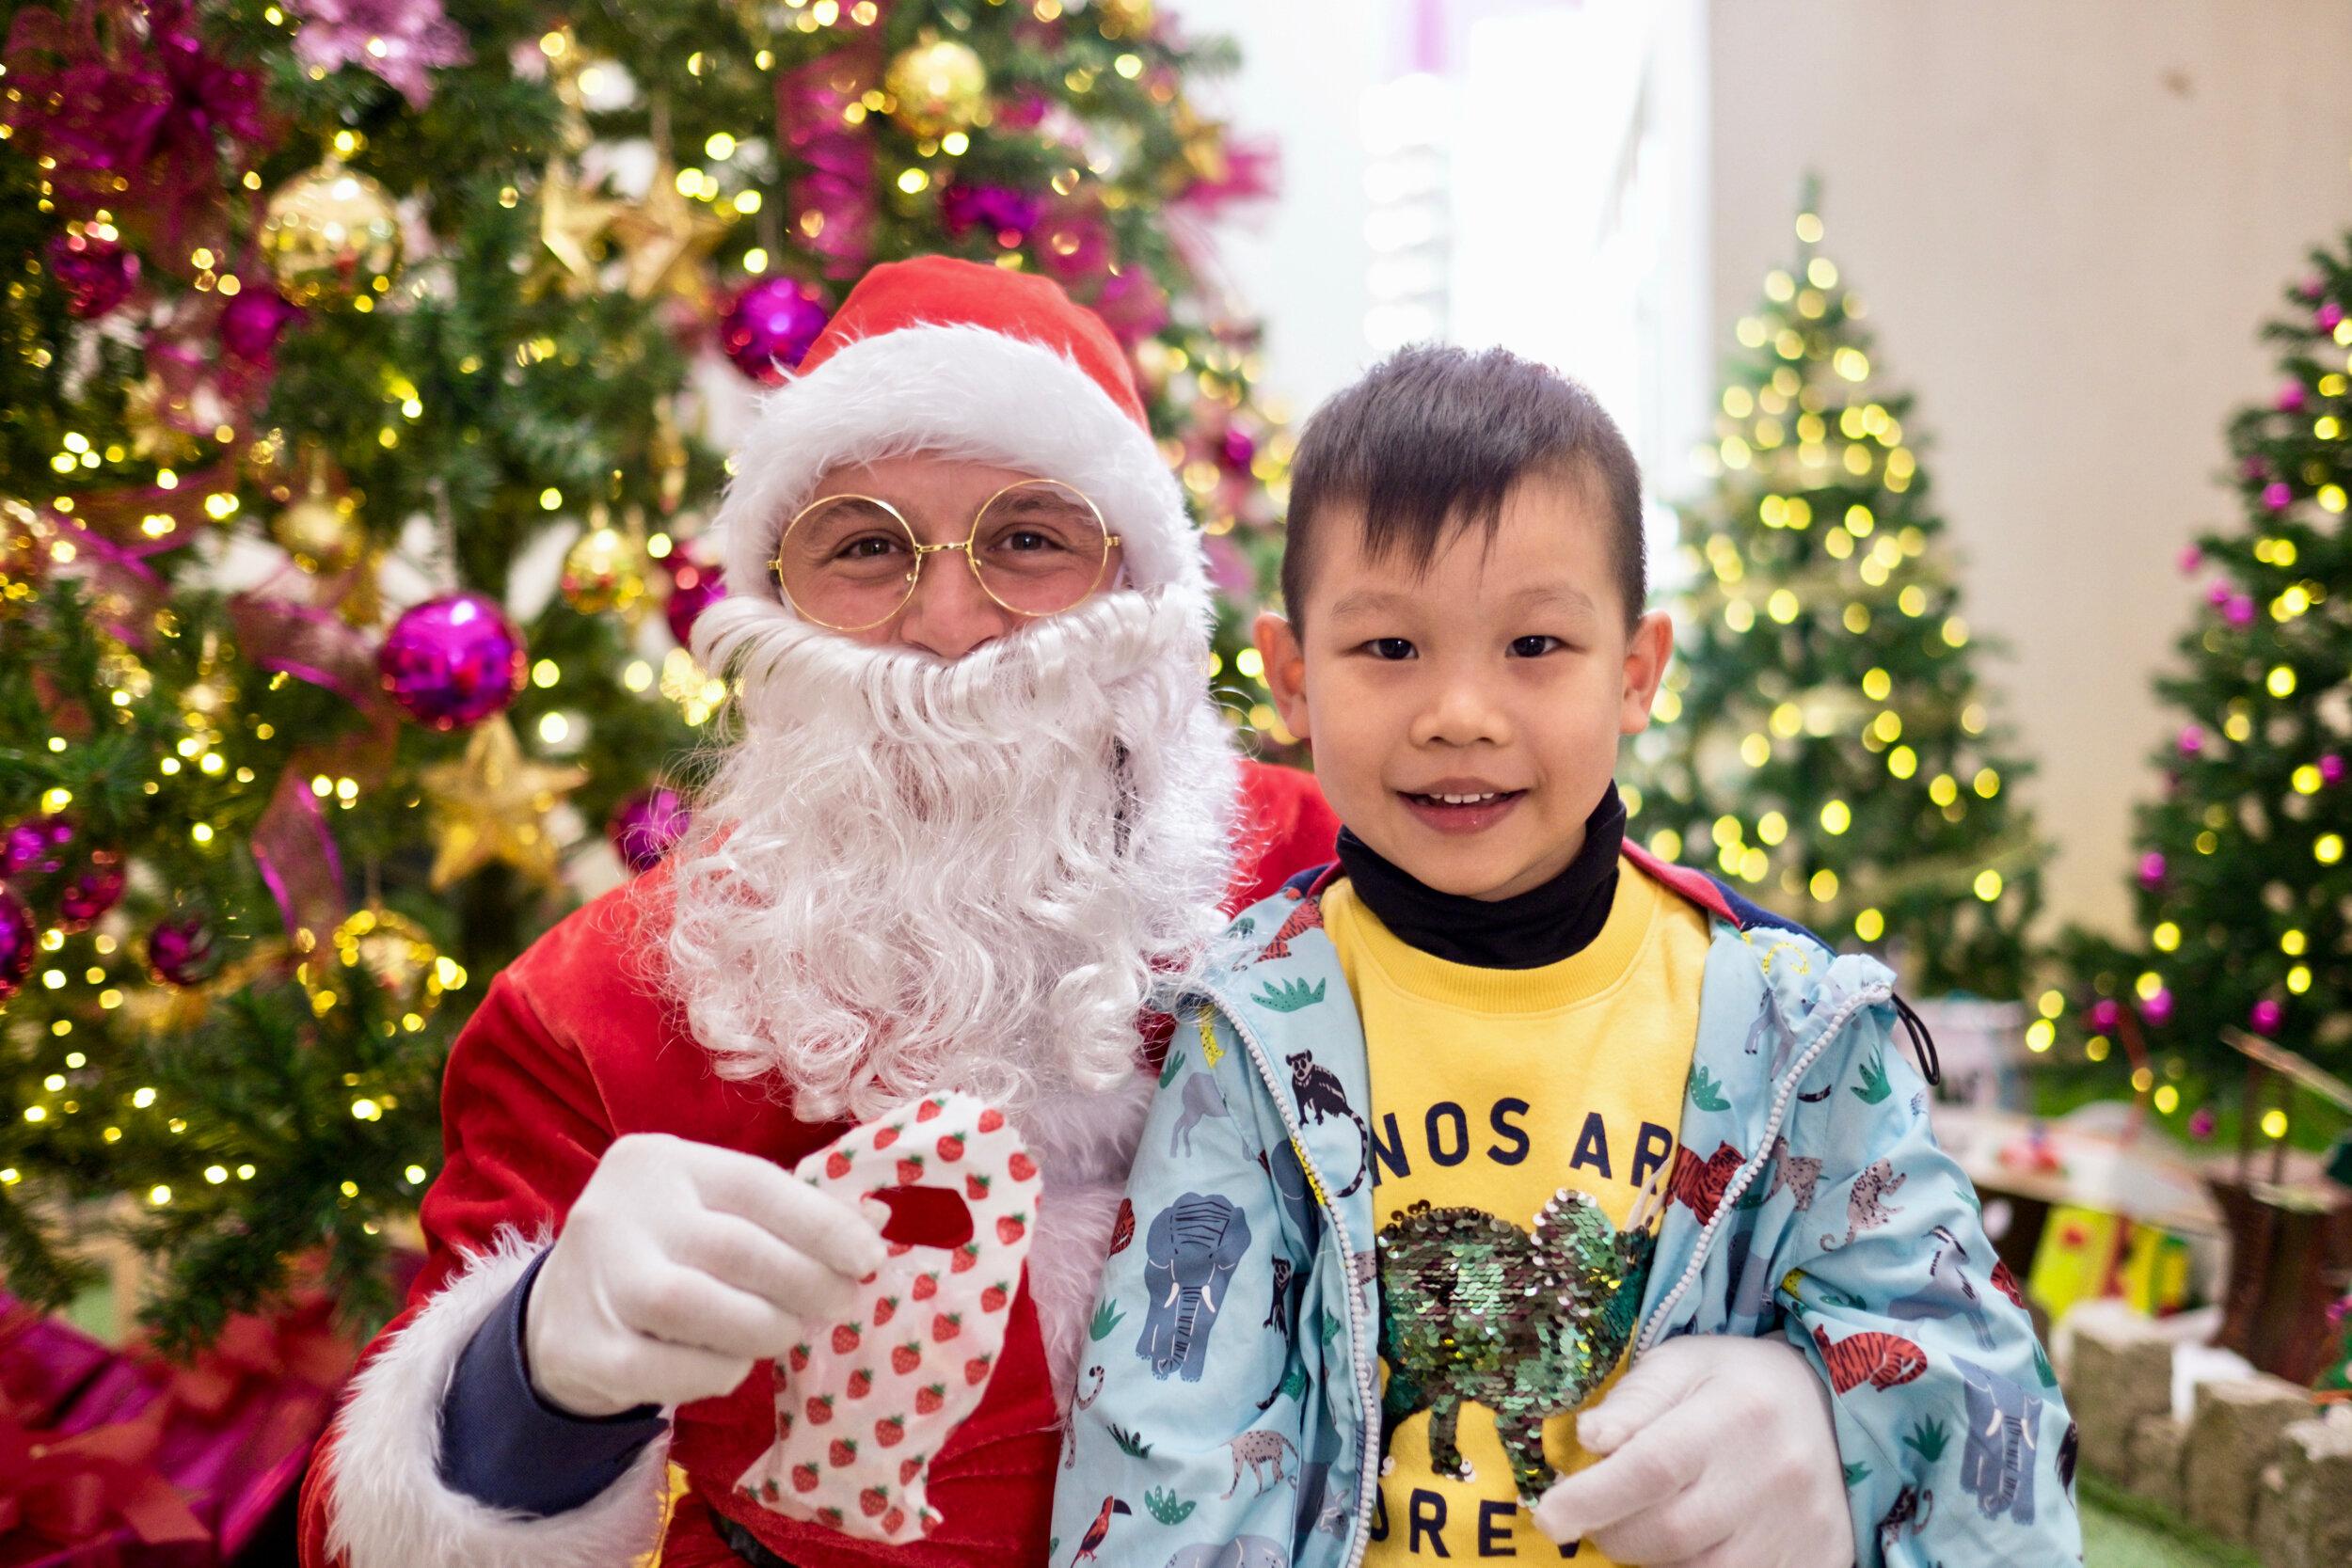 Photoshoot with Santa Clause-364.jpg